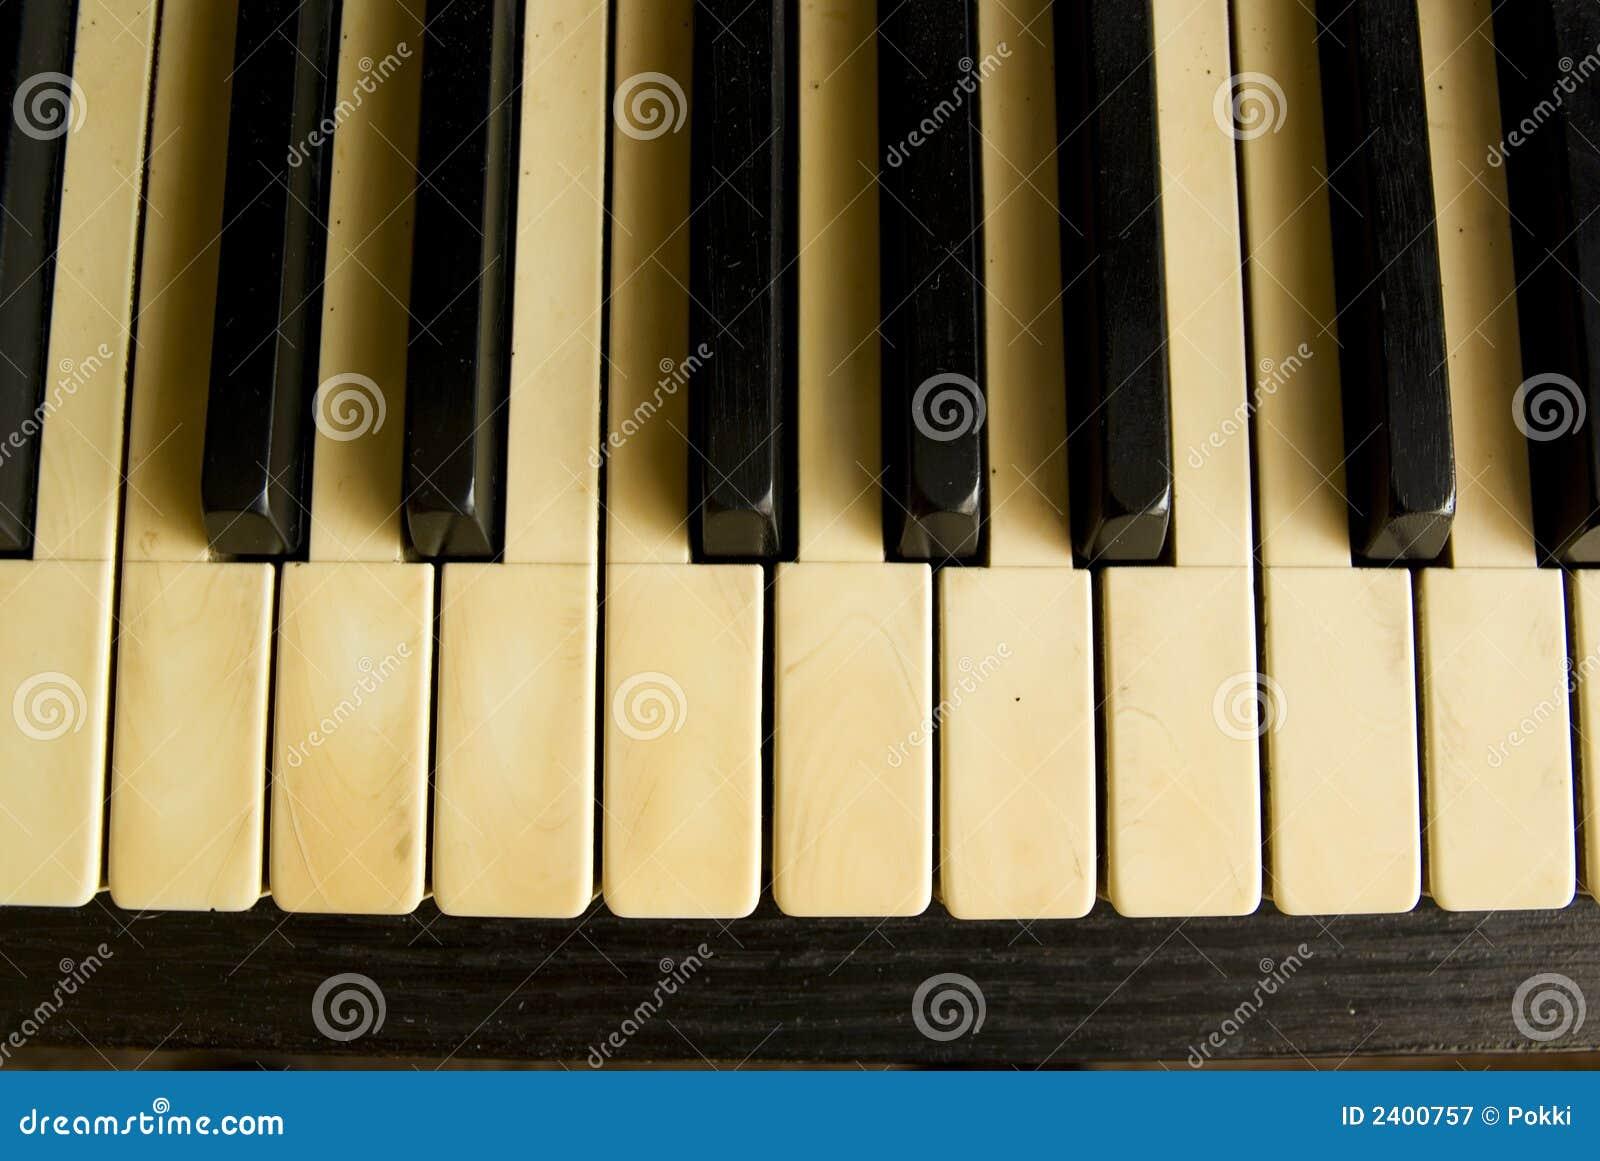 Teclado de piano antigo.